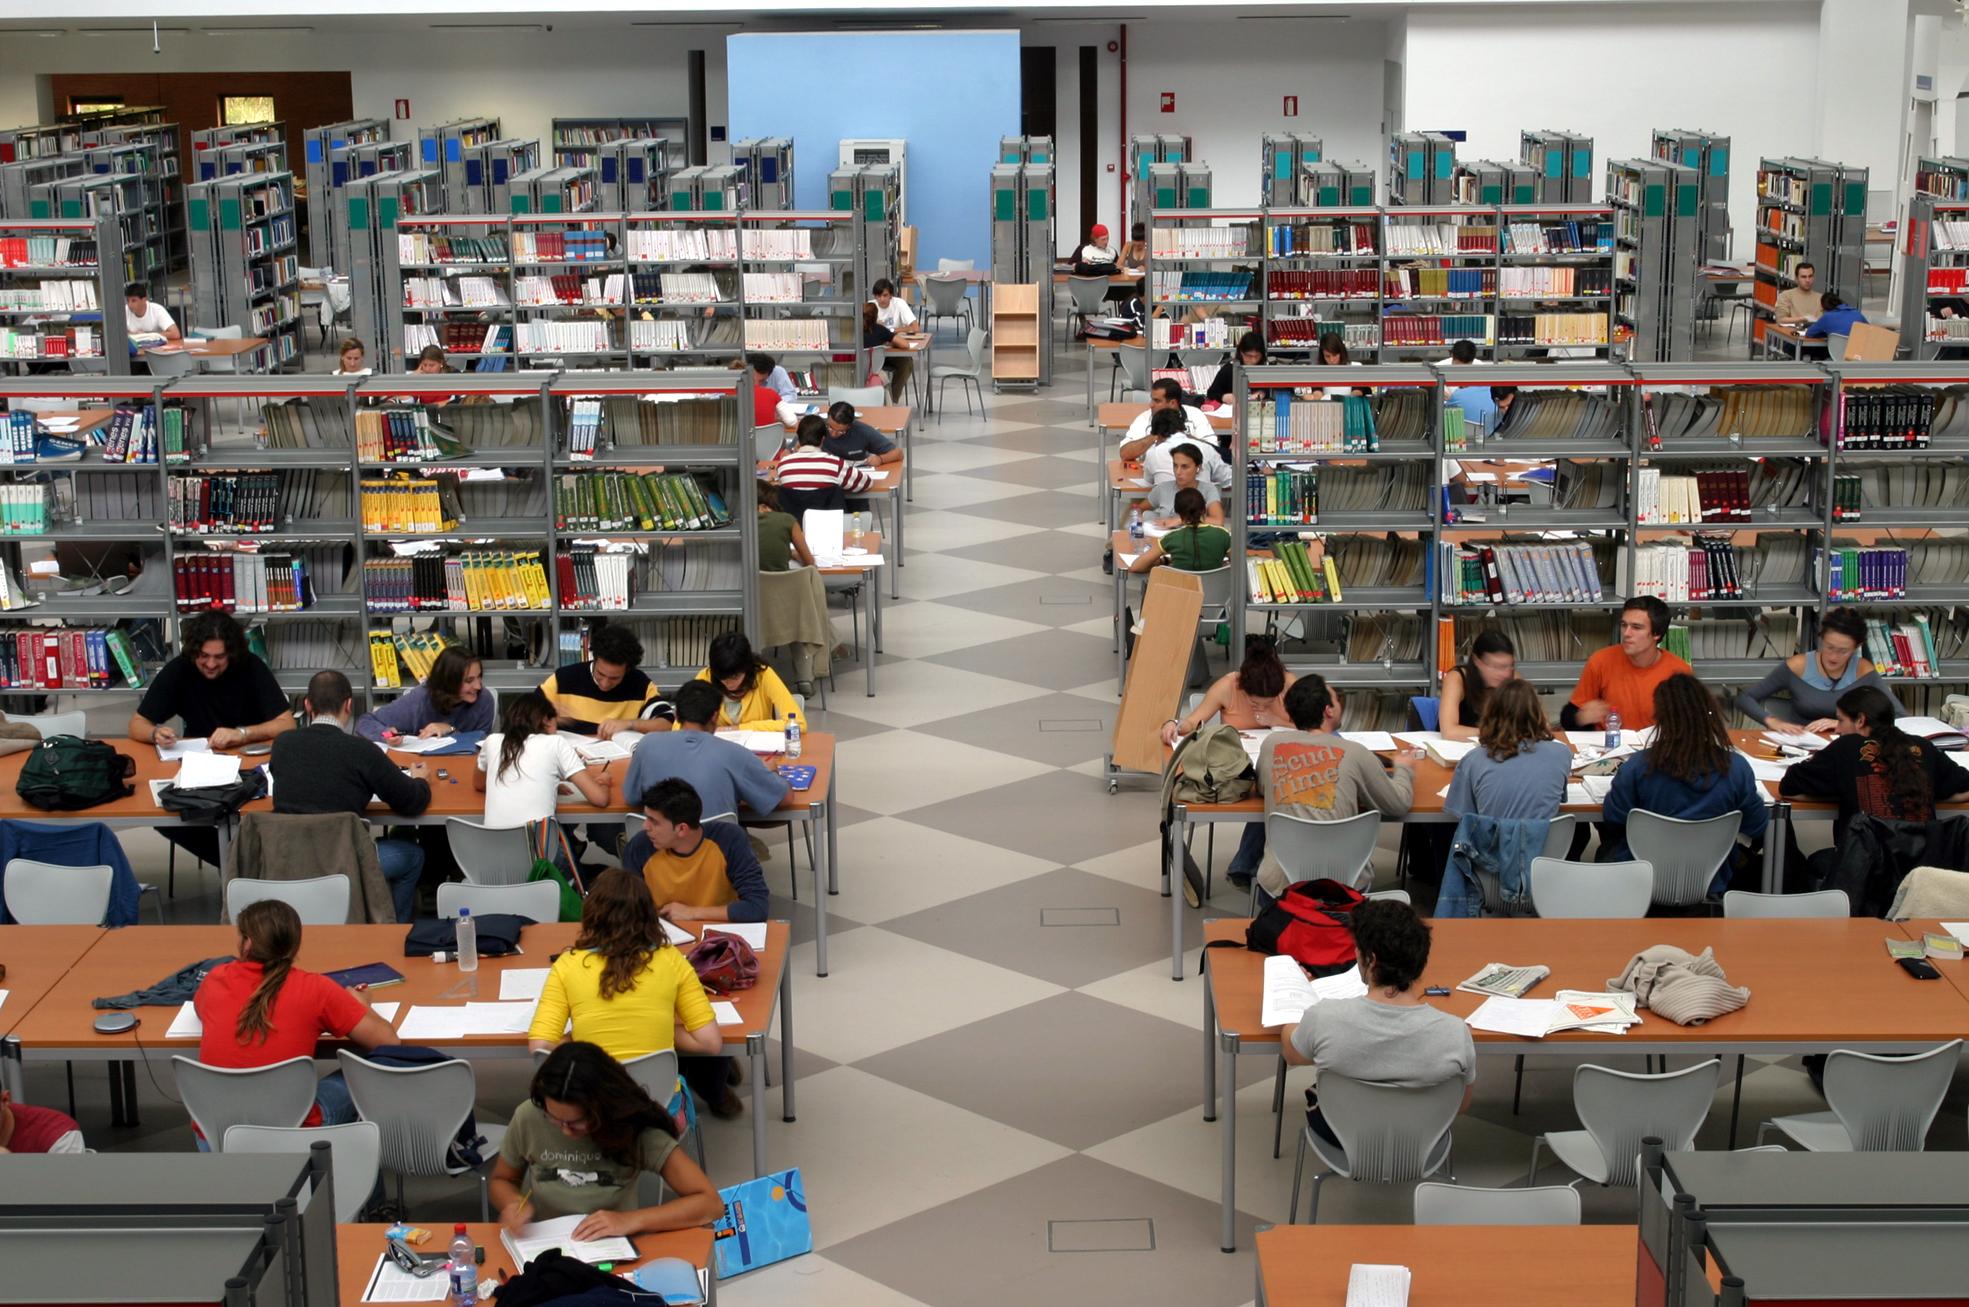 biblioteca campus